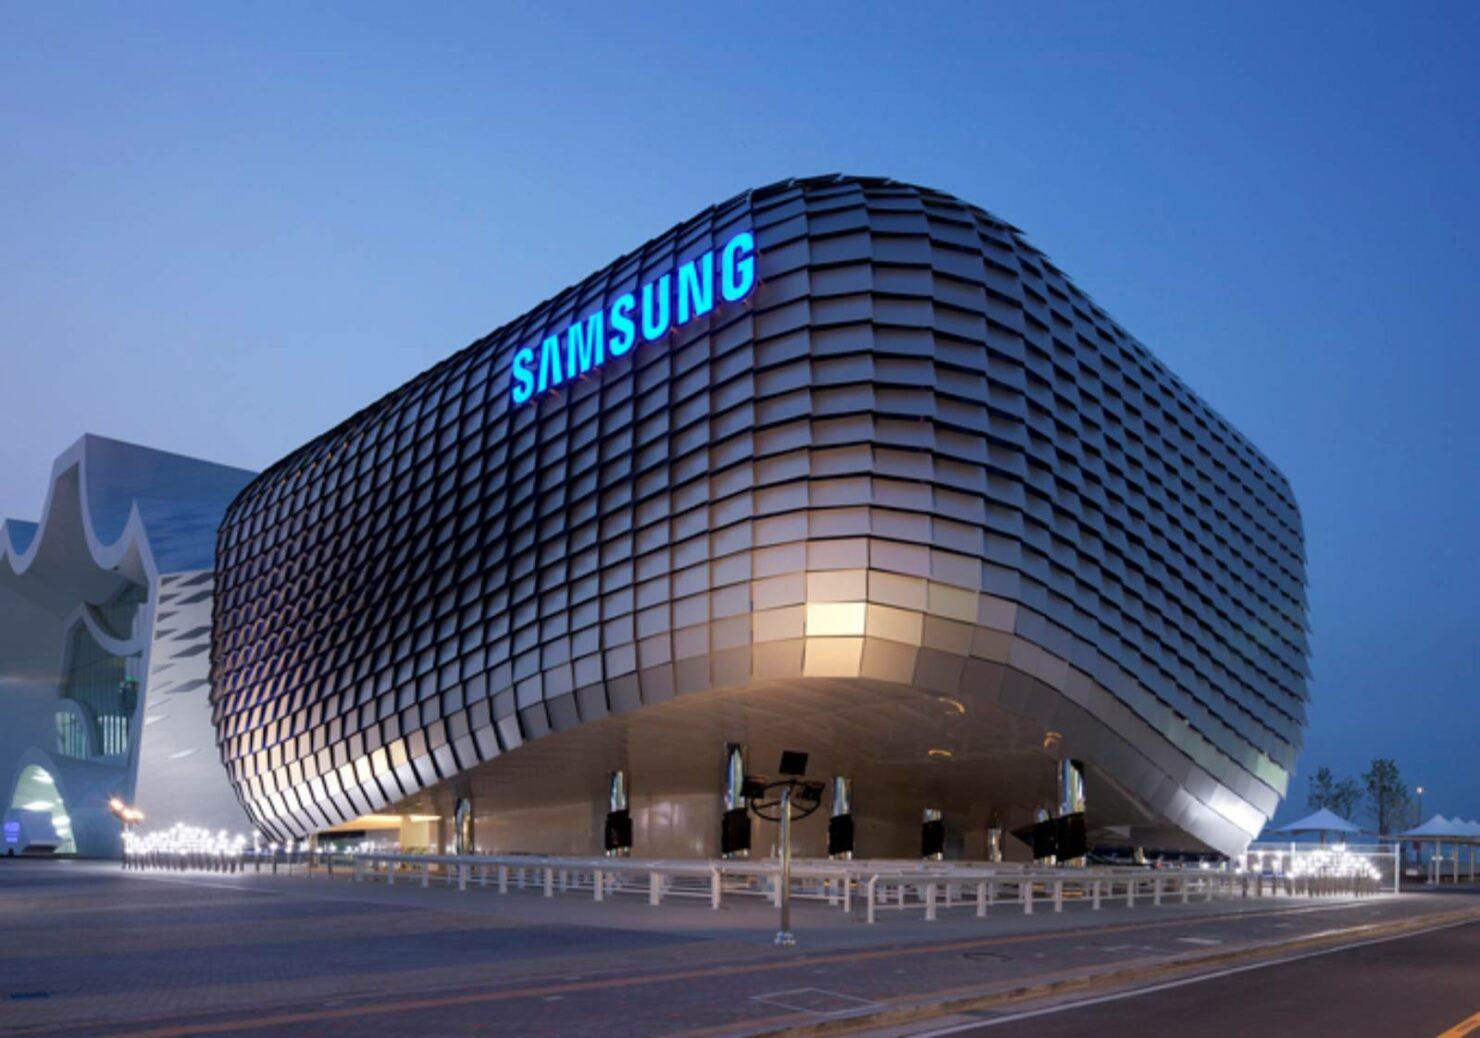 Despite the Note 7 Tragedy, Samsung Estimates Its Highest Q4 Profit Run in 3 Years